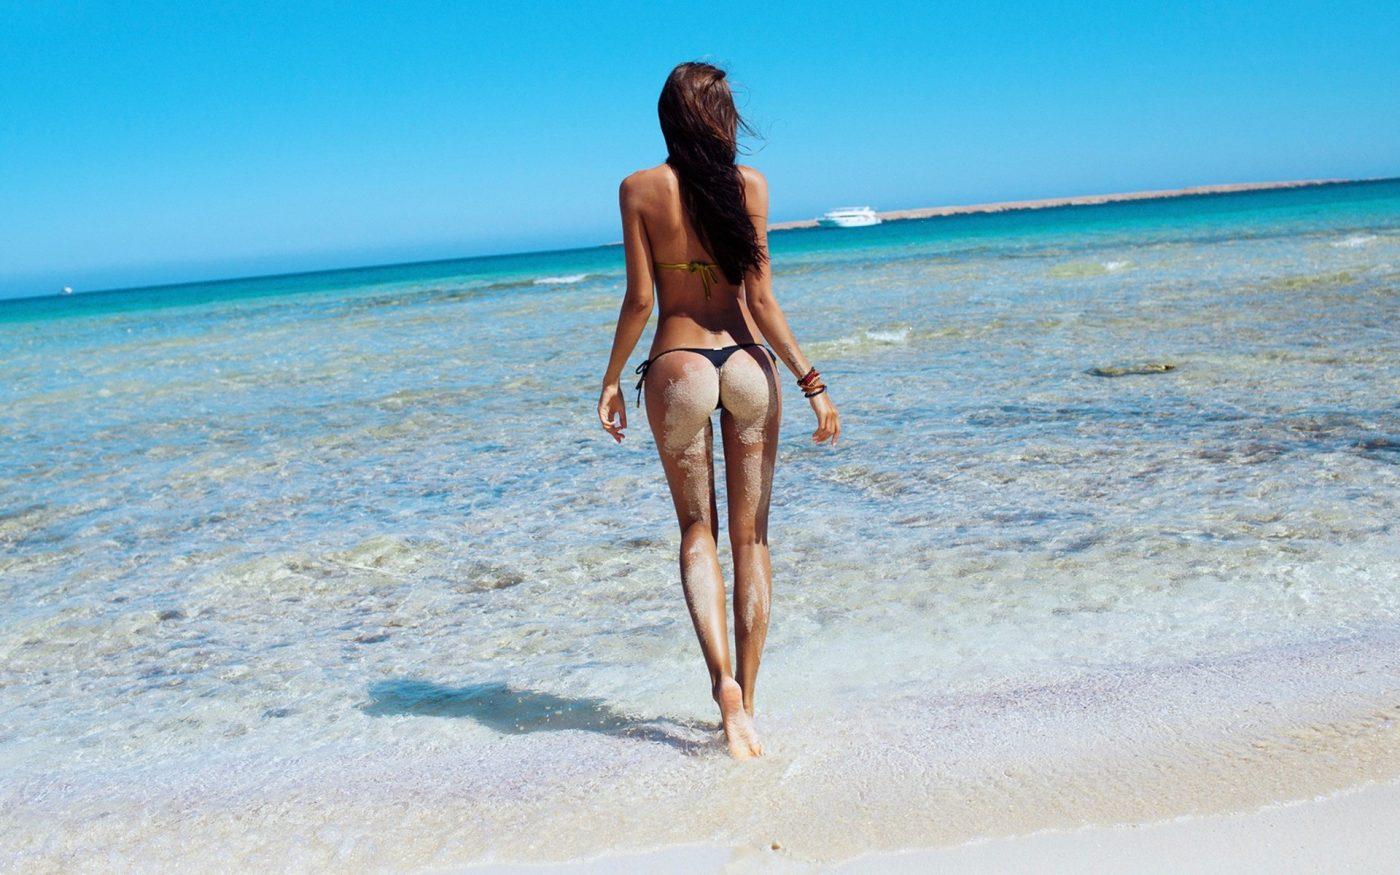 women-model-sea-long-hair-shore-sand